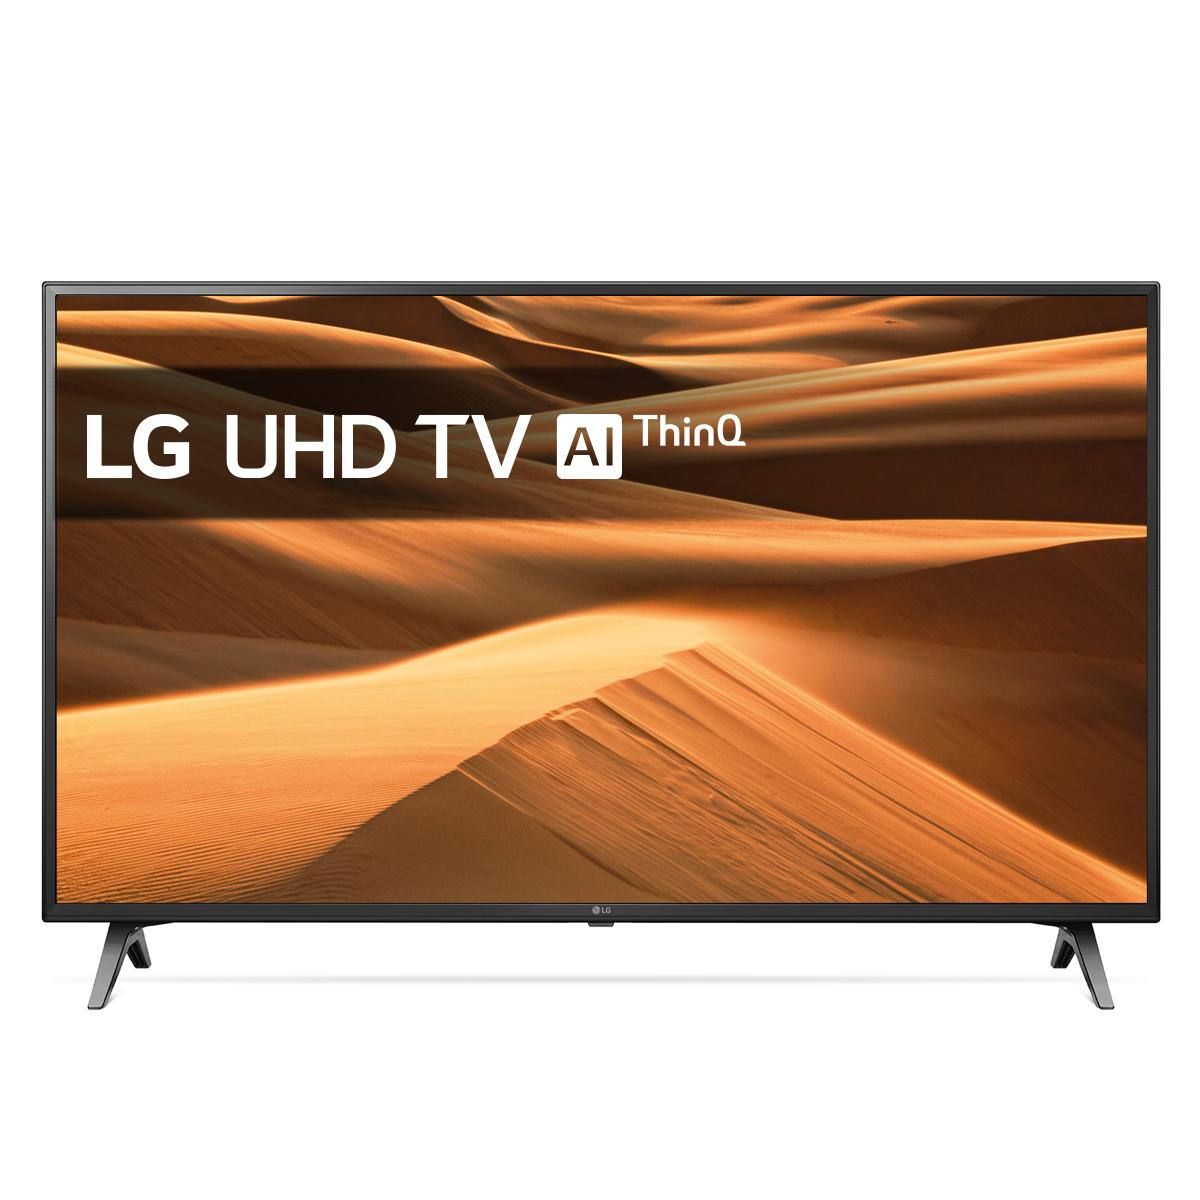 LG 43UM7100PLB TV 109.2 cm 43